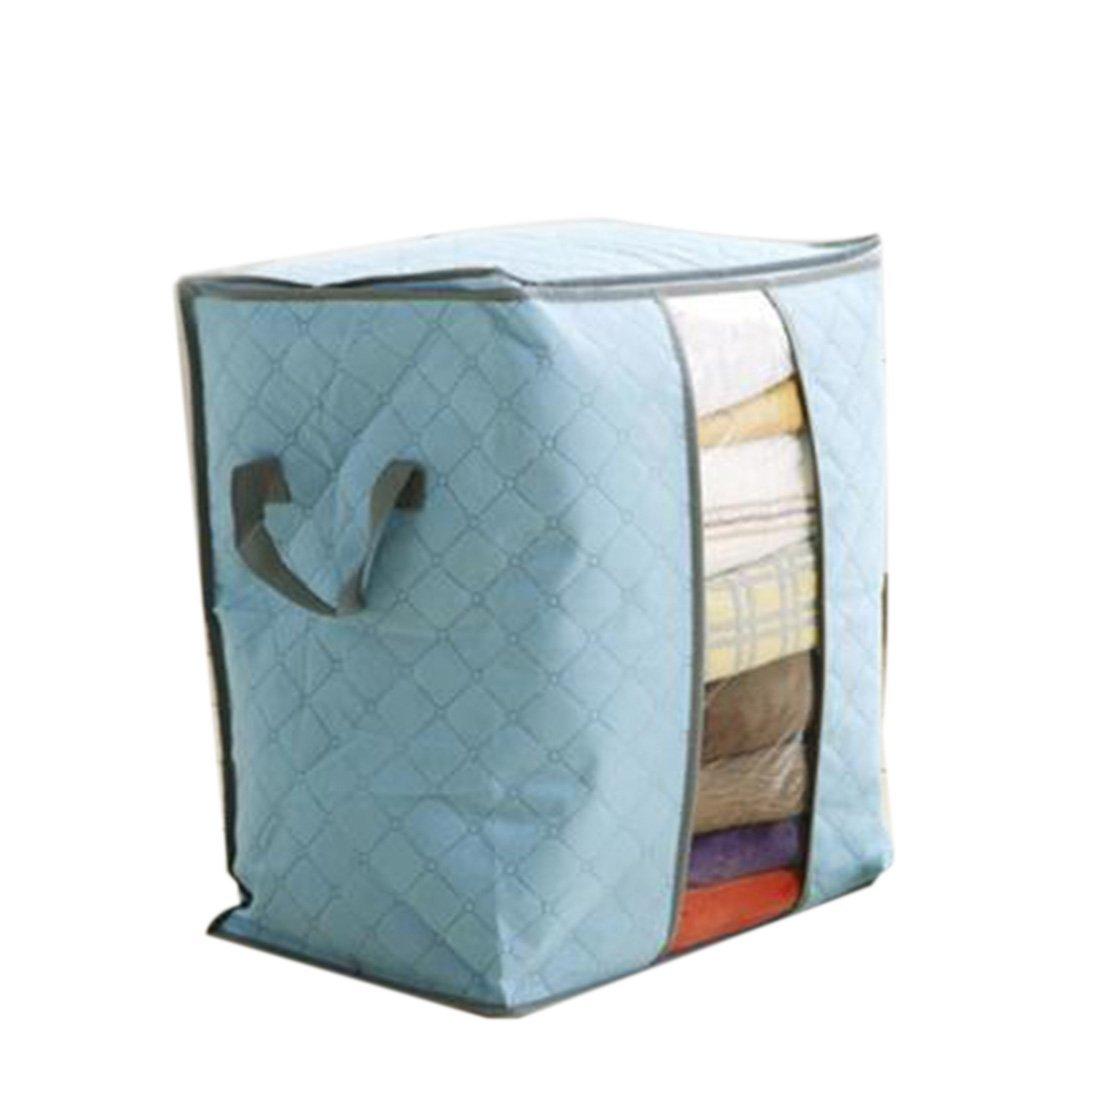 Joylive 2016 Storage Bag Box Portable Organizer Non Woven Underbed Pouch Storage Box Bamboo Clothing Storage Bag